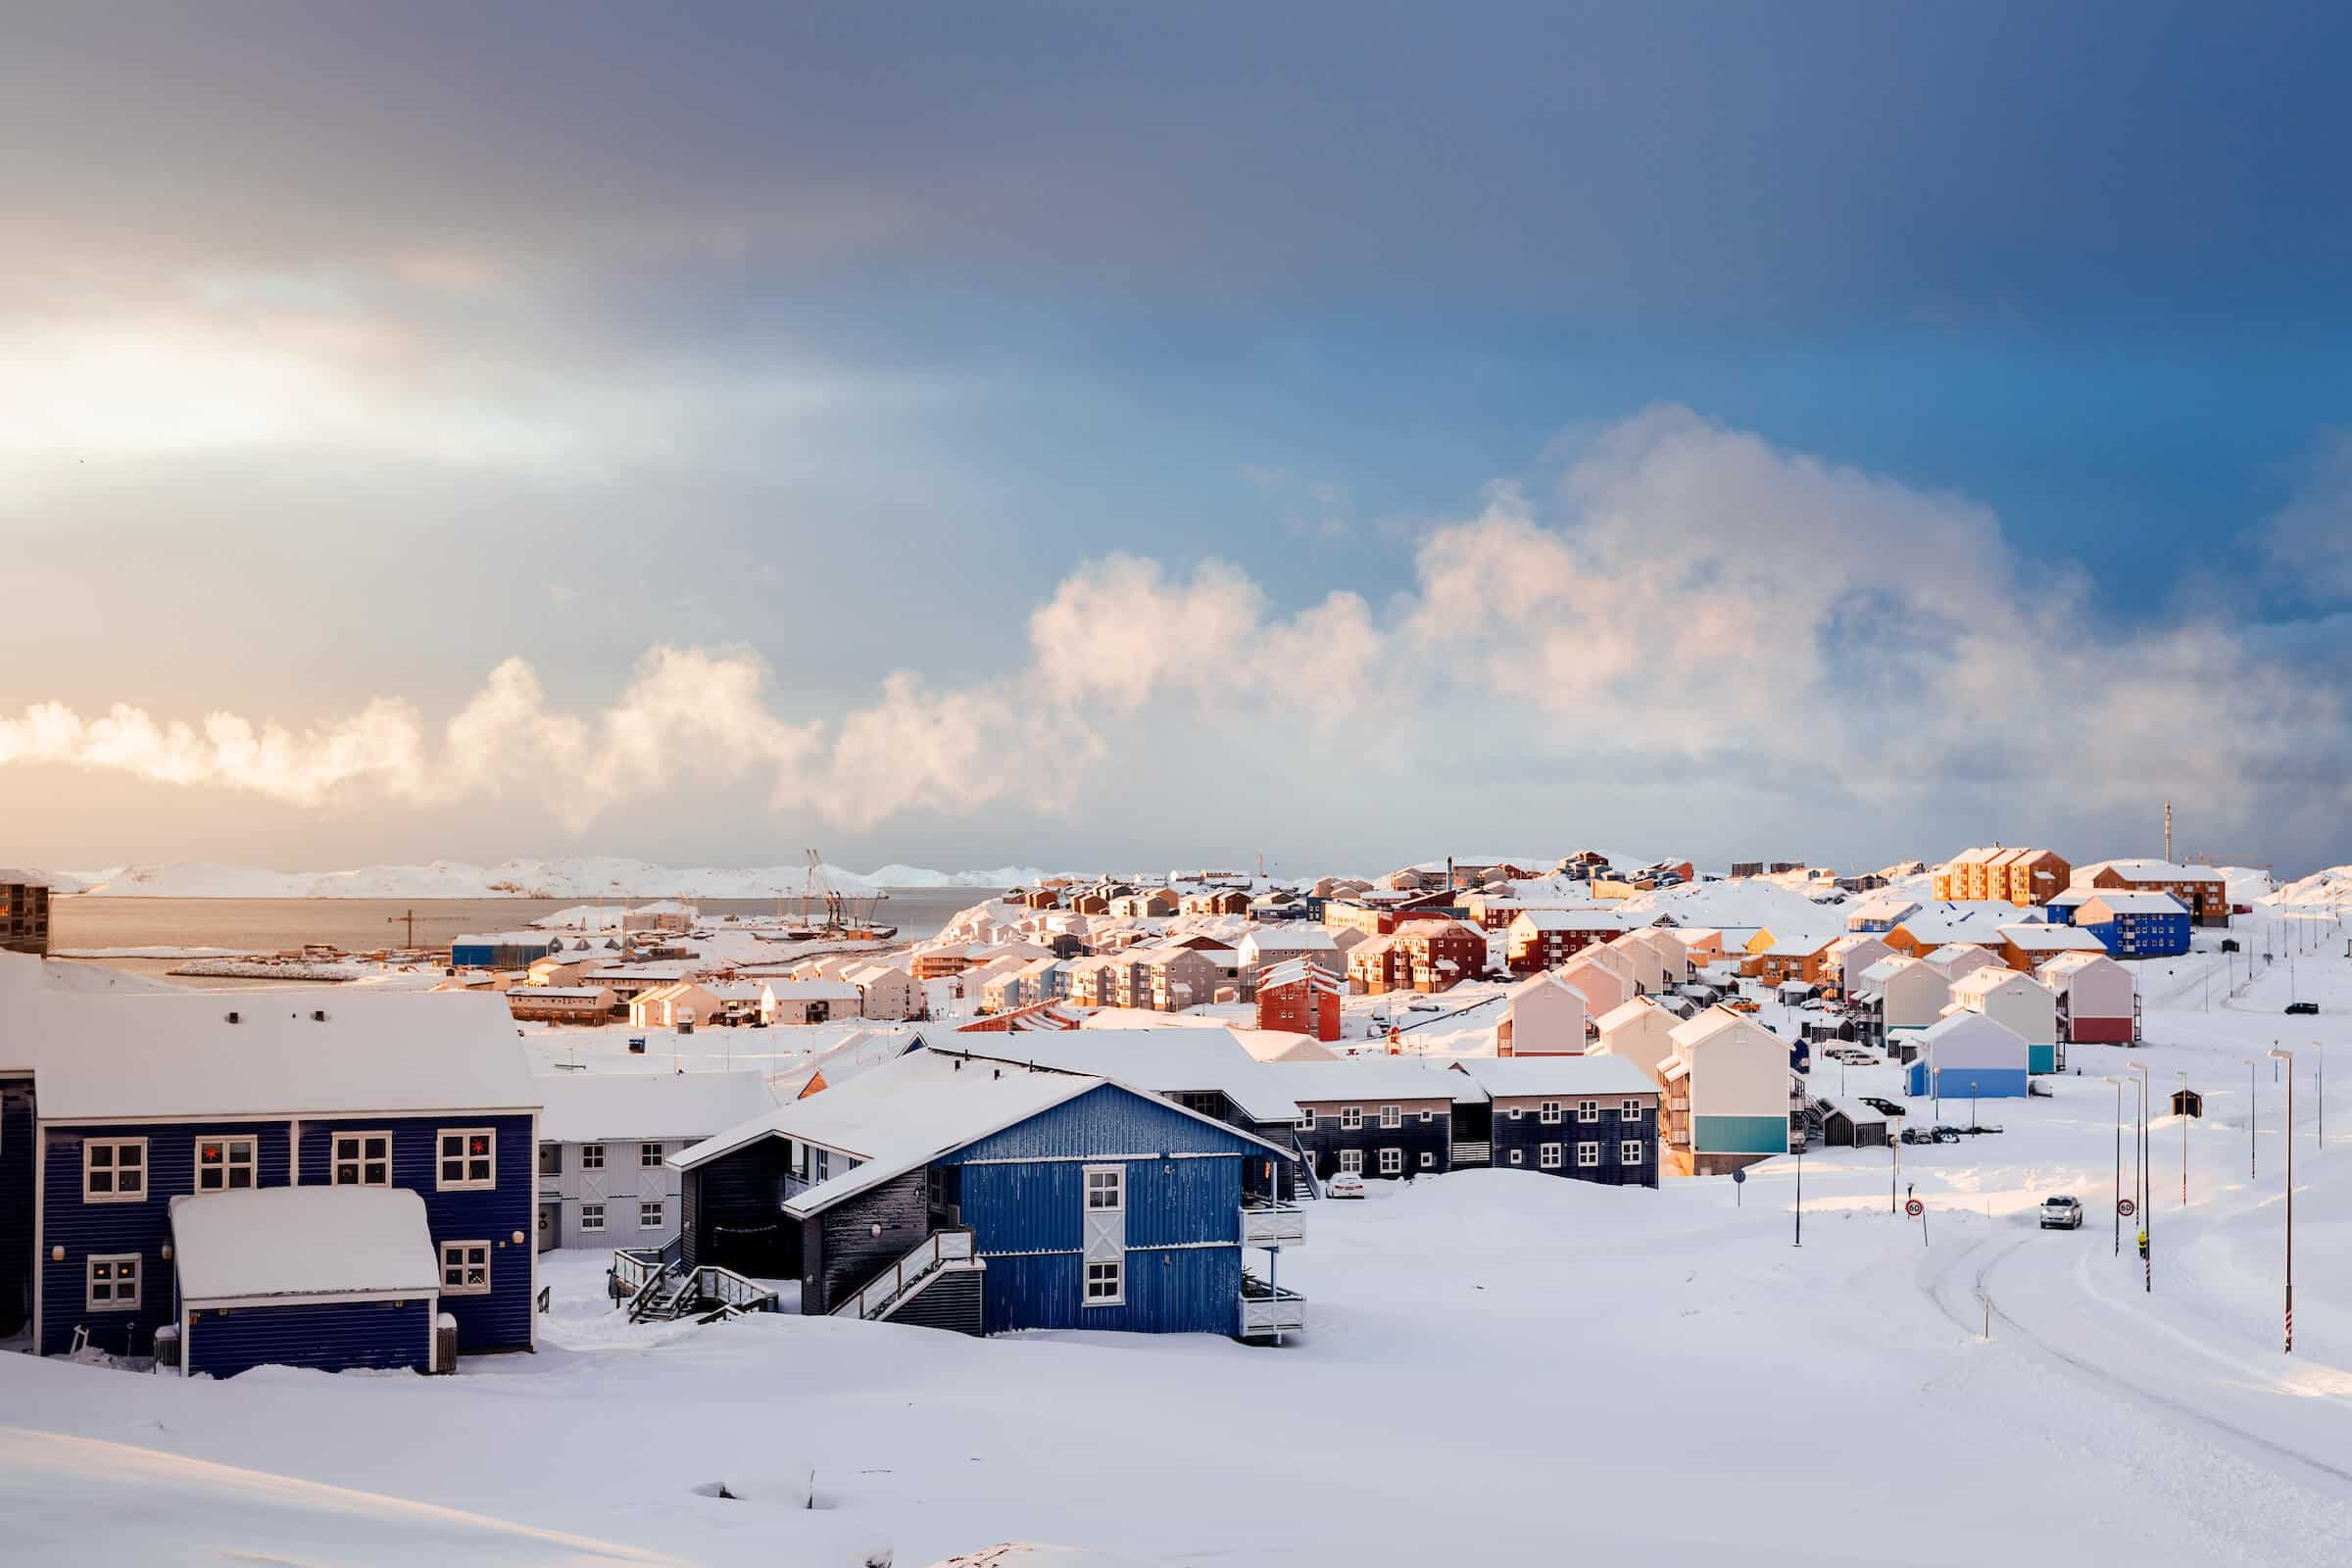 Sunrise over Nuussuaq in Nuuk in Greenland. Photo by Rebecca Gustafsson - Visit Greenlandjpg